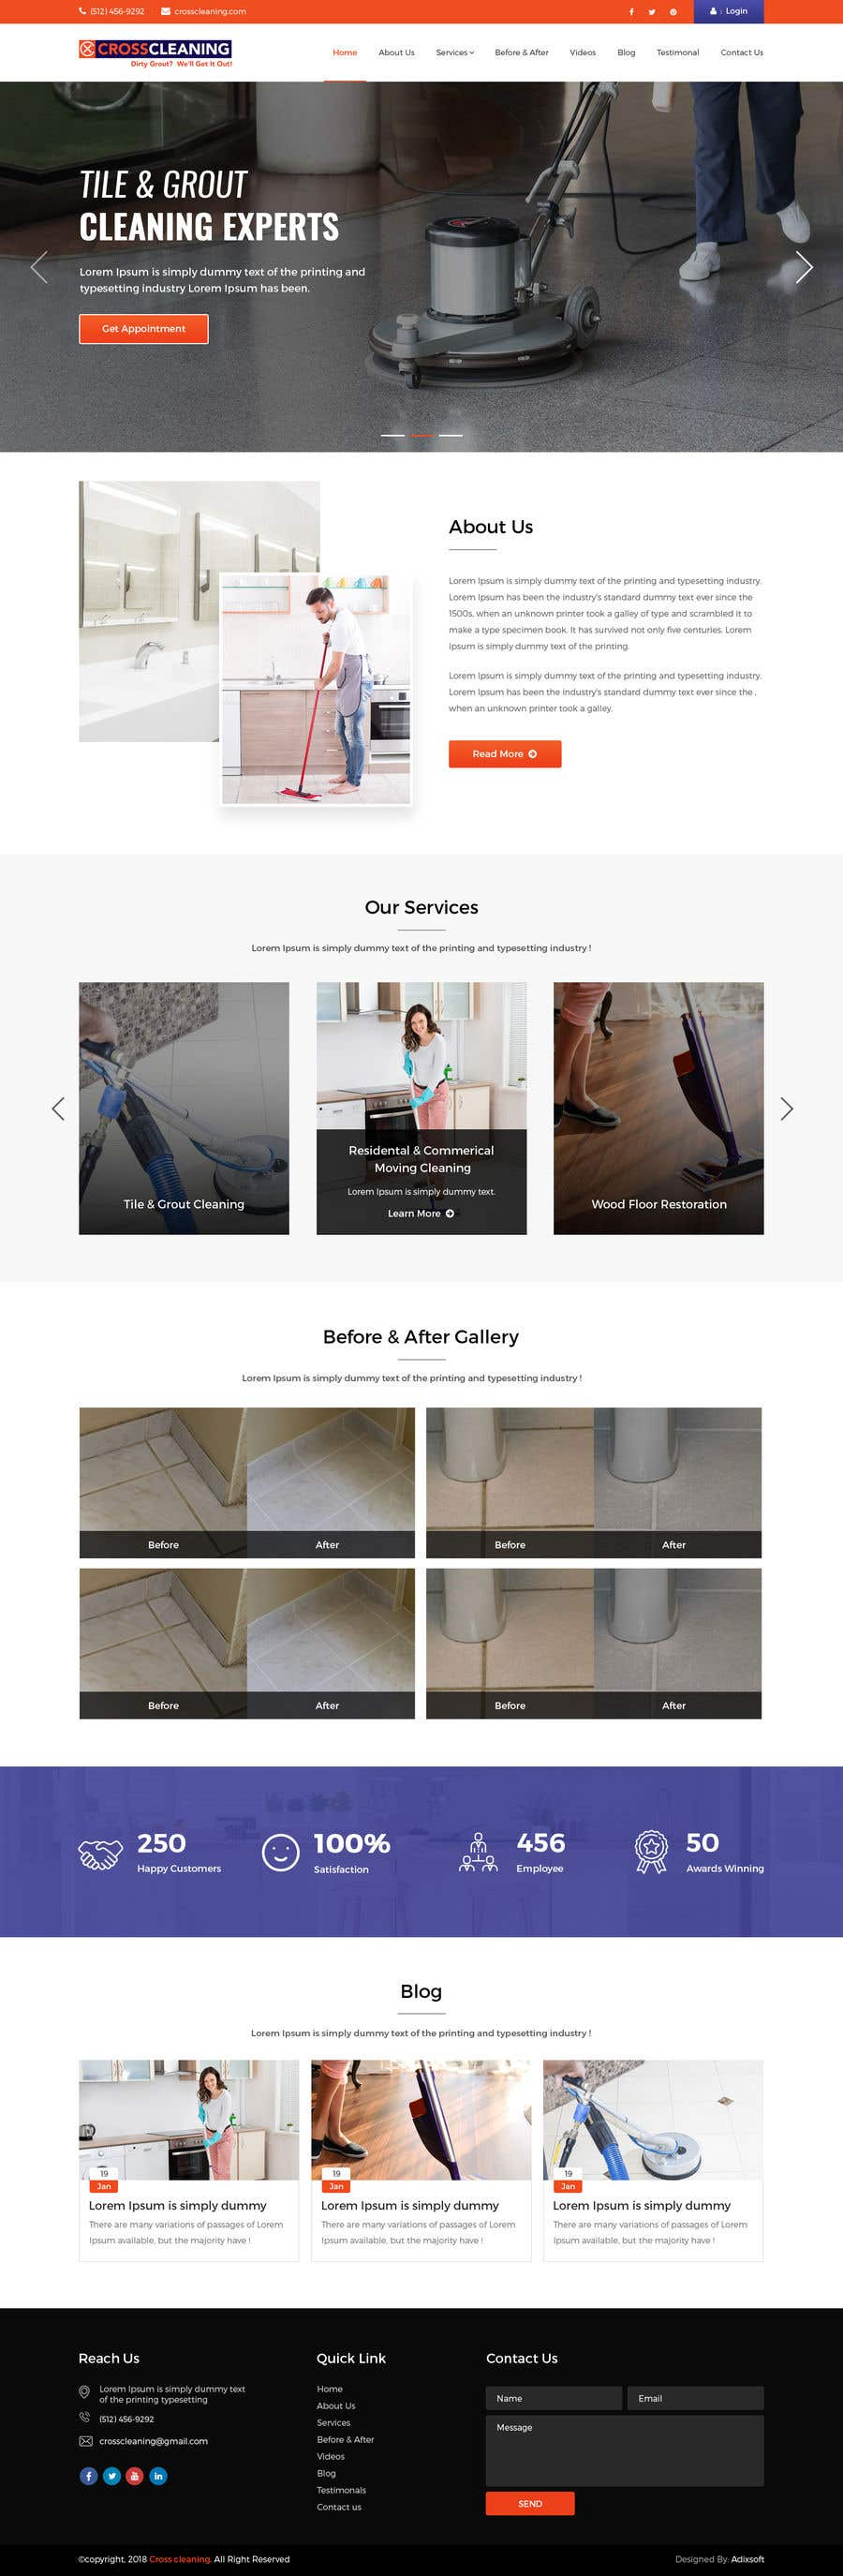 Kilpailutyö #10 kilpailussa Wow Me with Creative Redesign of Wordpress Website